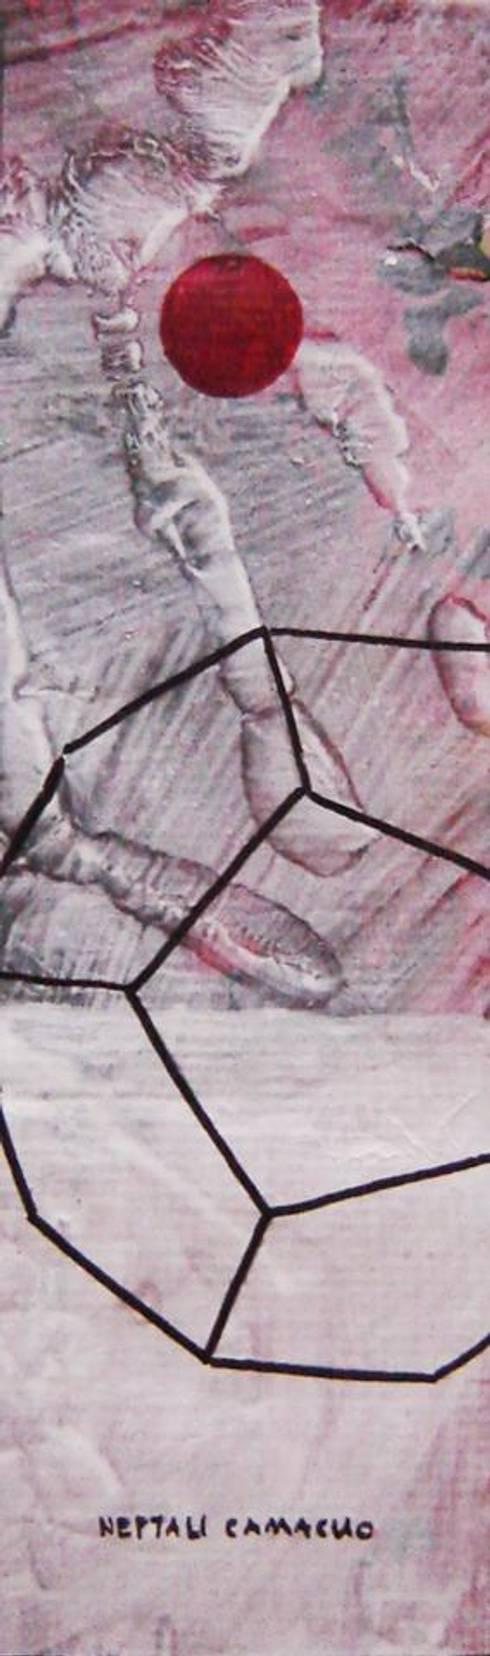 Abstraccionismo Geom Trico De Neftal Camacho Art Homify # Muebles De Cocina Neftali